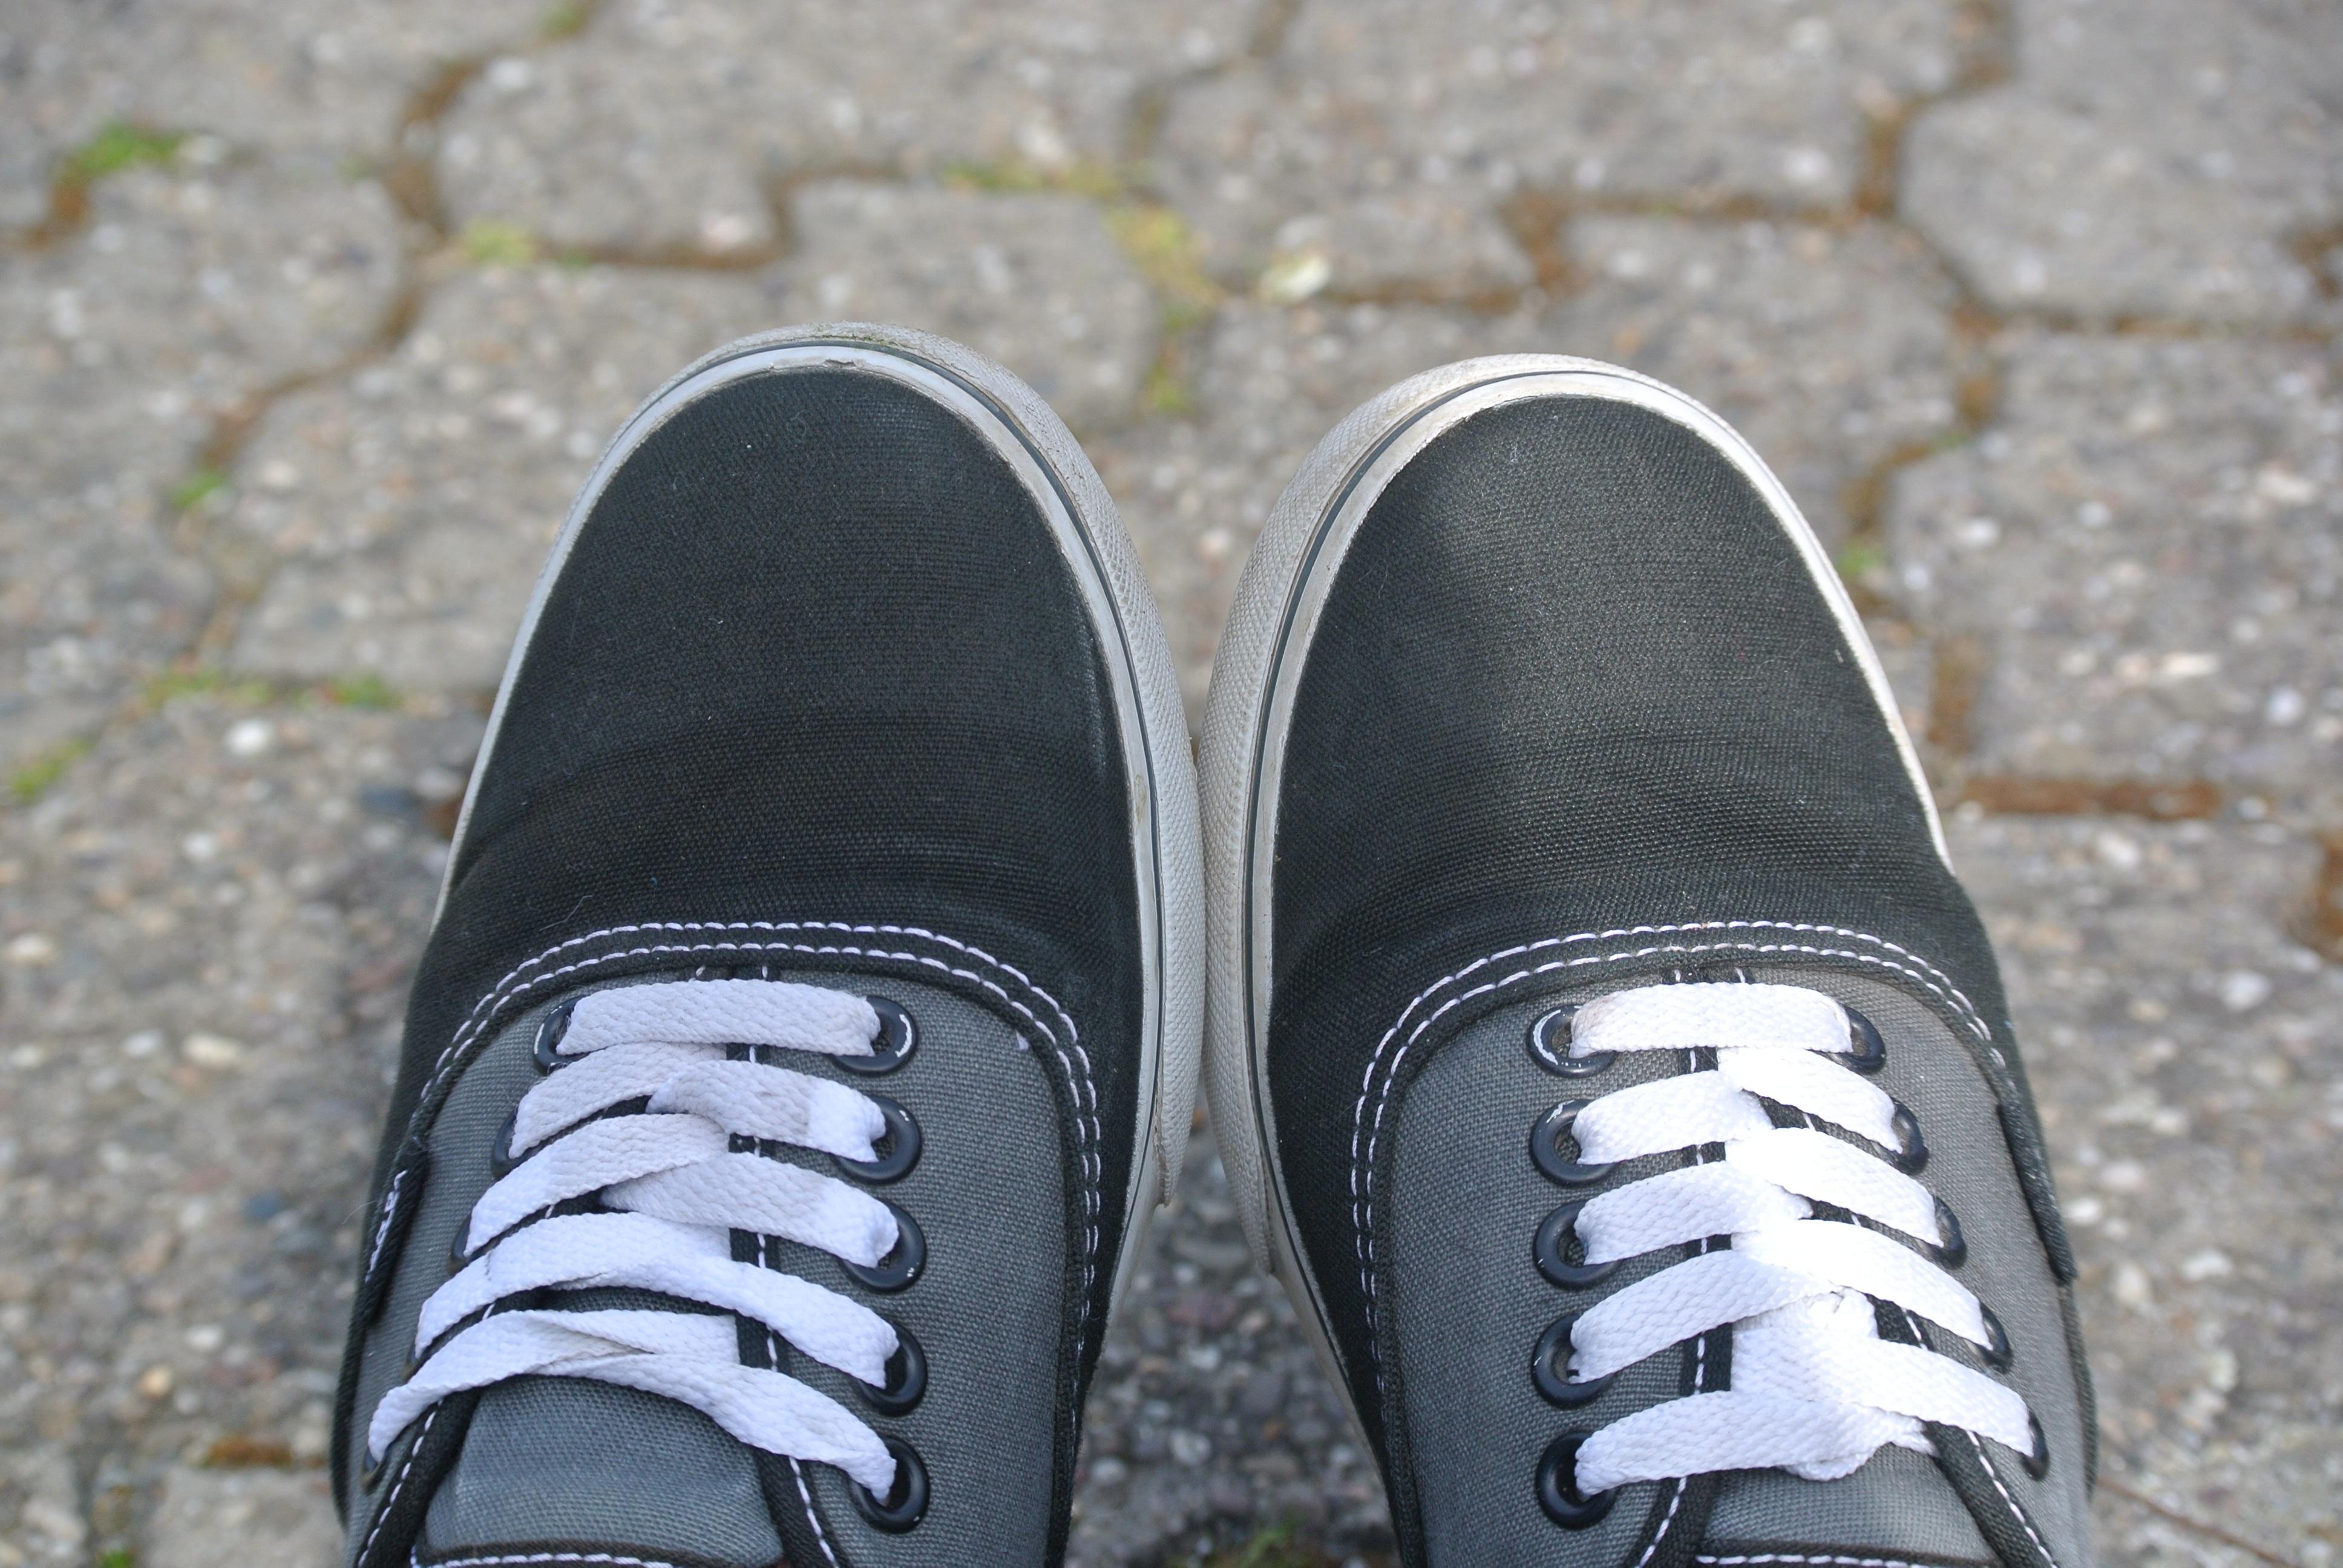 sepatu jalan putih kulit aspal gelap hitam putih hitam tali sepatu sepatu  Abu-abu sepatu 79fd164f18